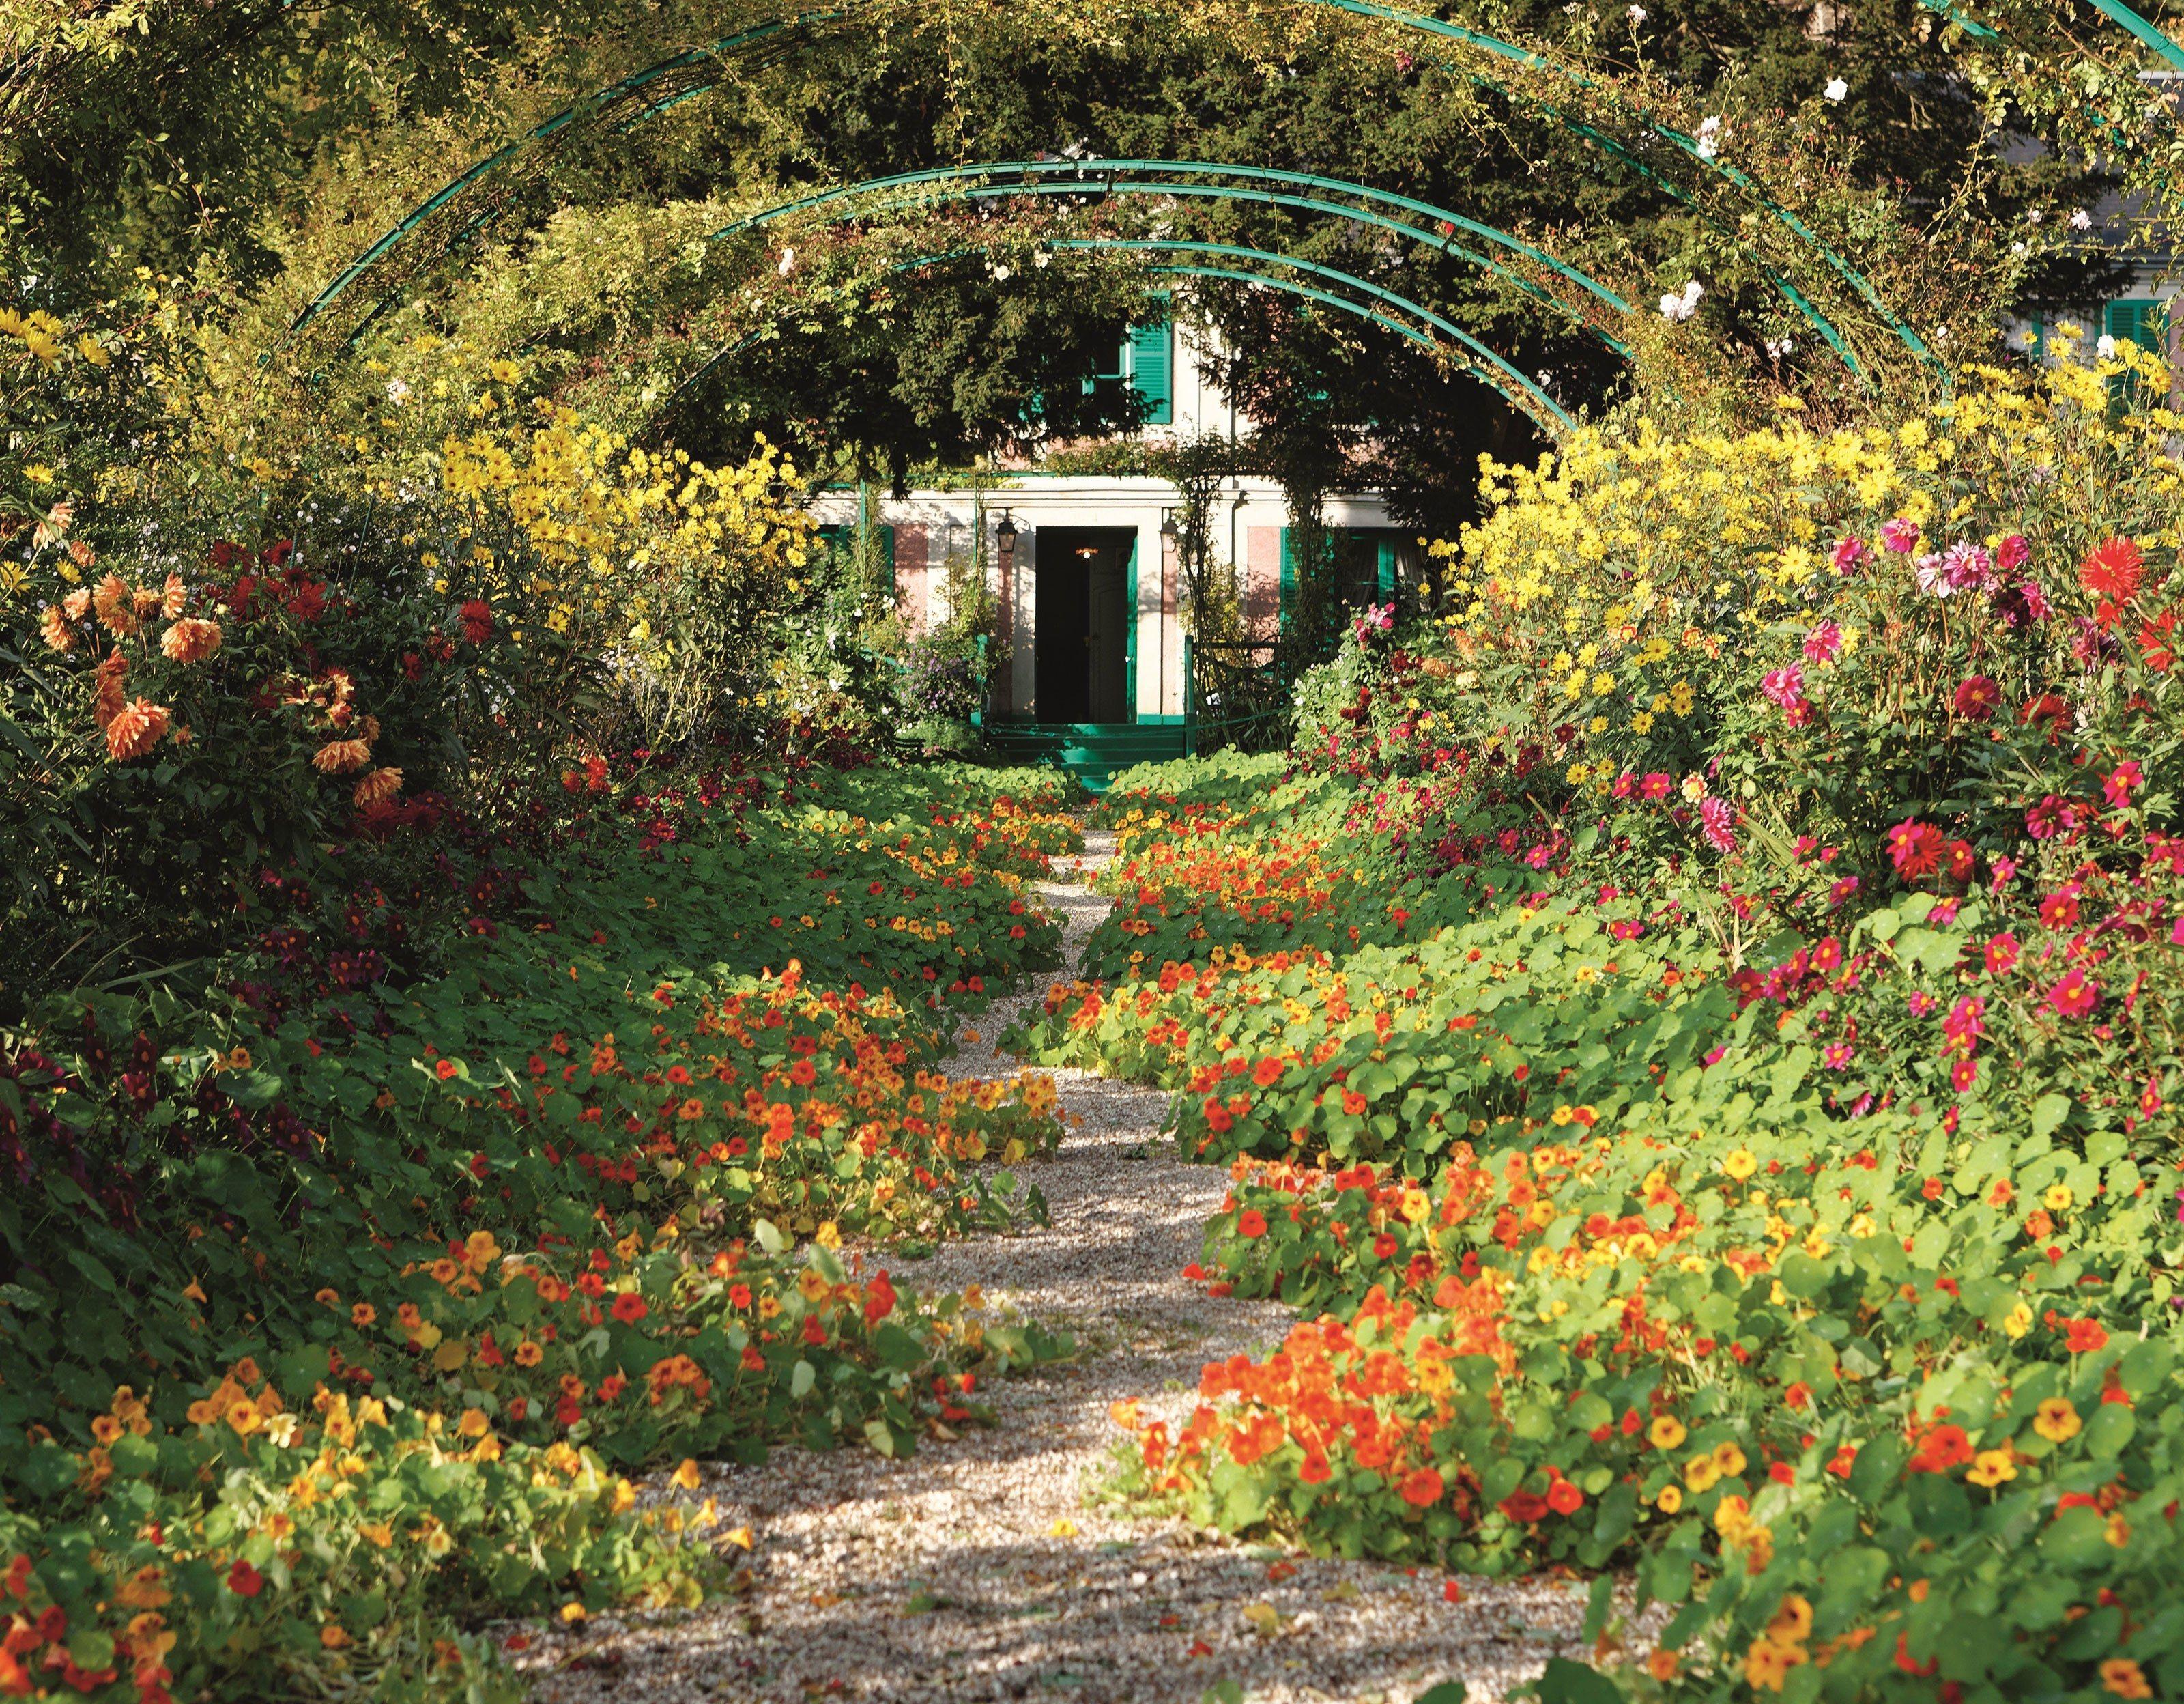 Tour Claude Monet S Incredible Gardens Bilder Tradgard